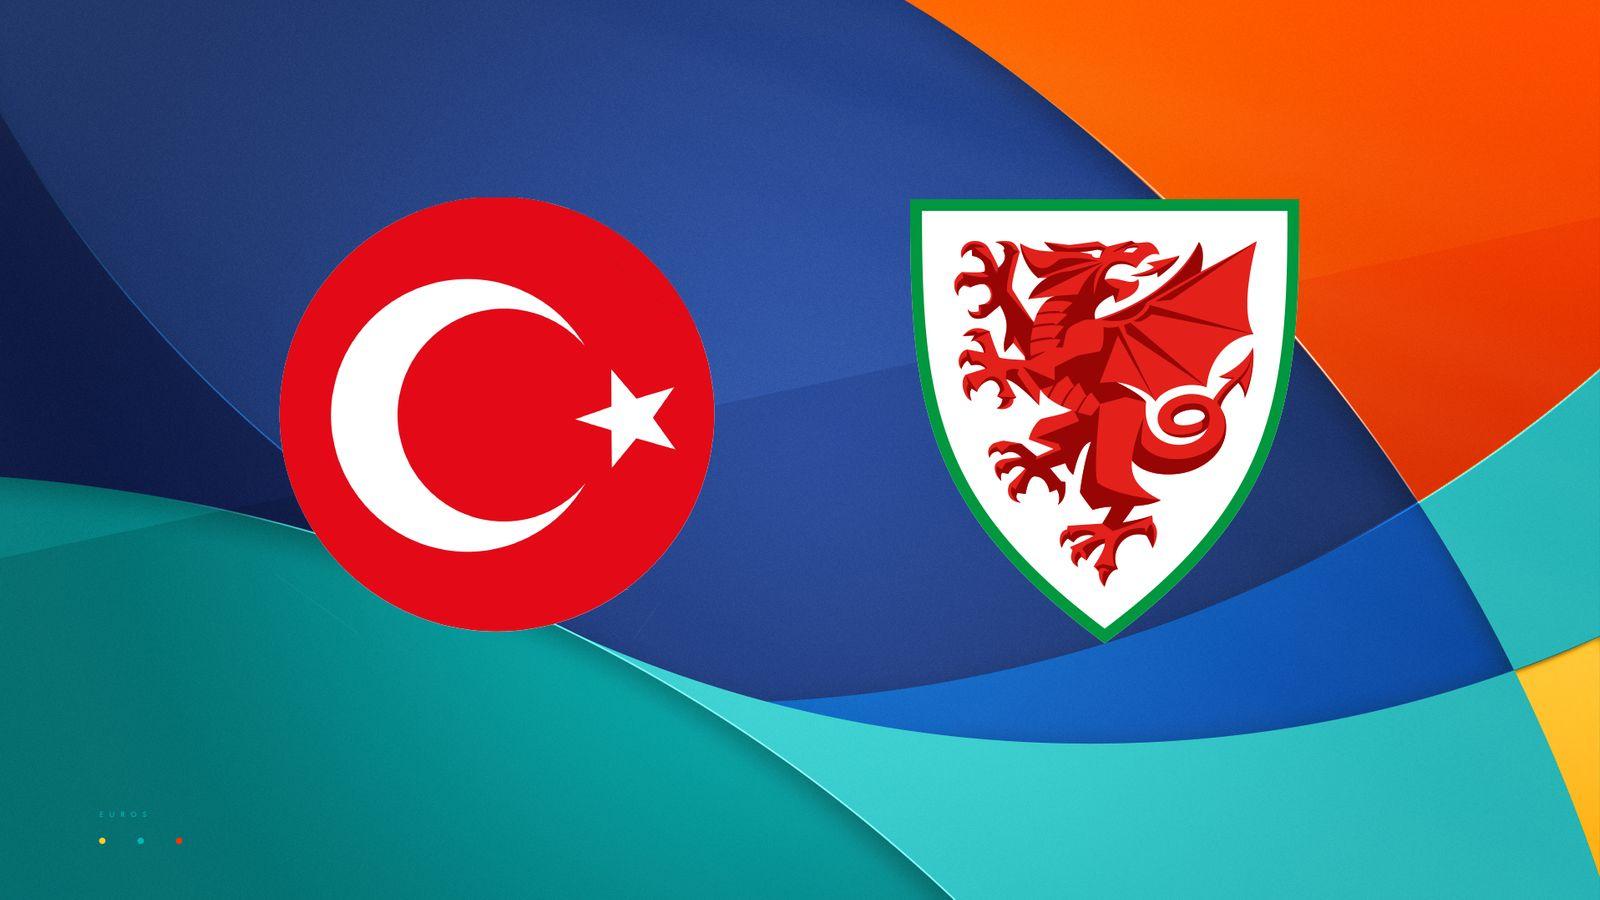 Wales 2-0 Turkey : Ramsey scored on a nice opening